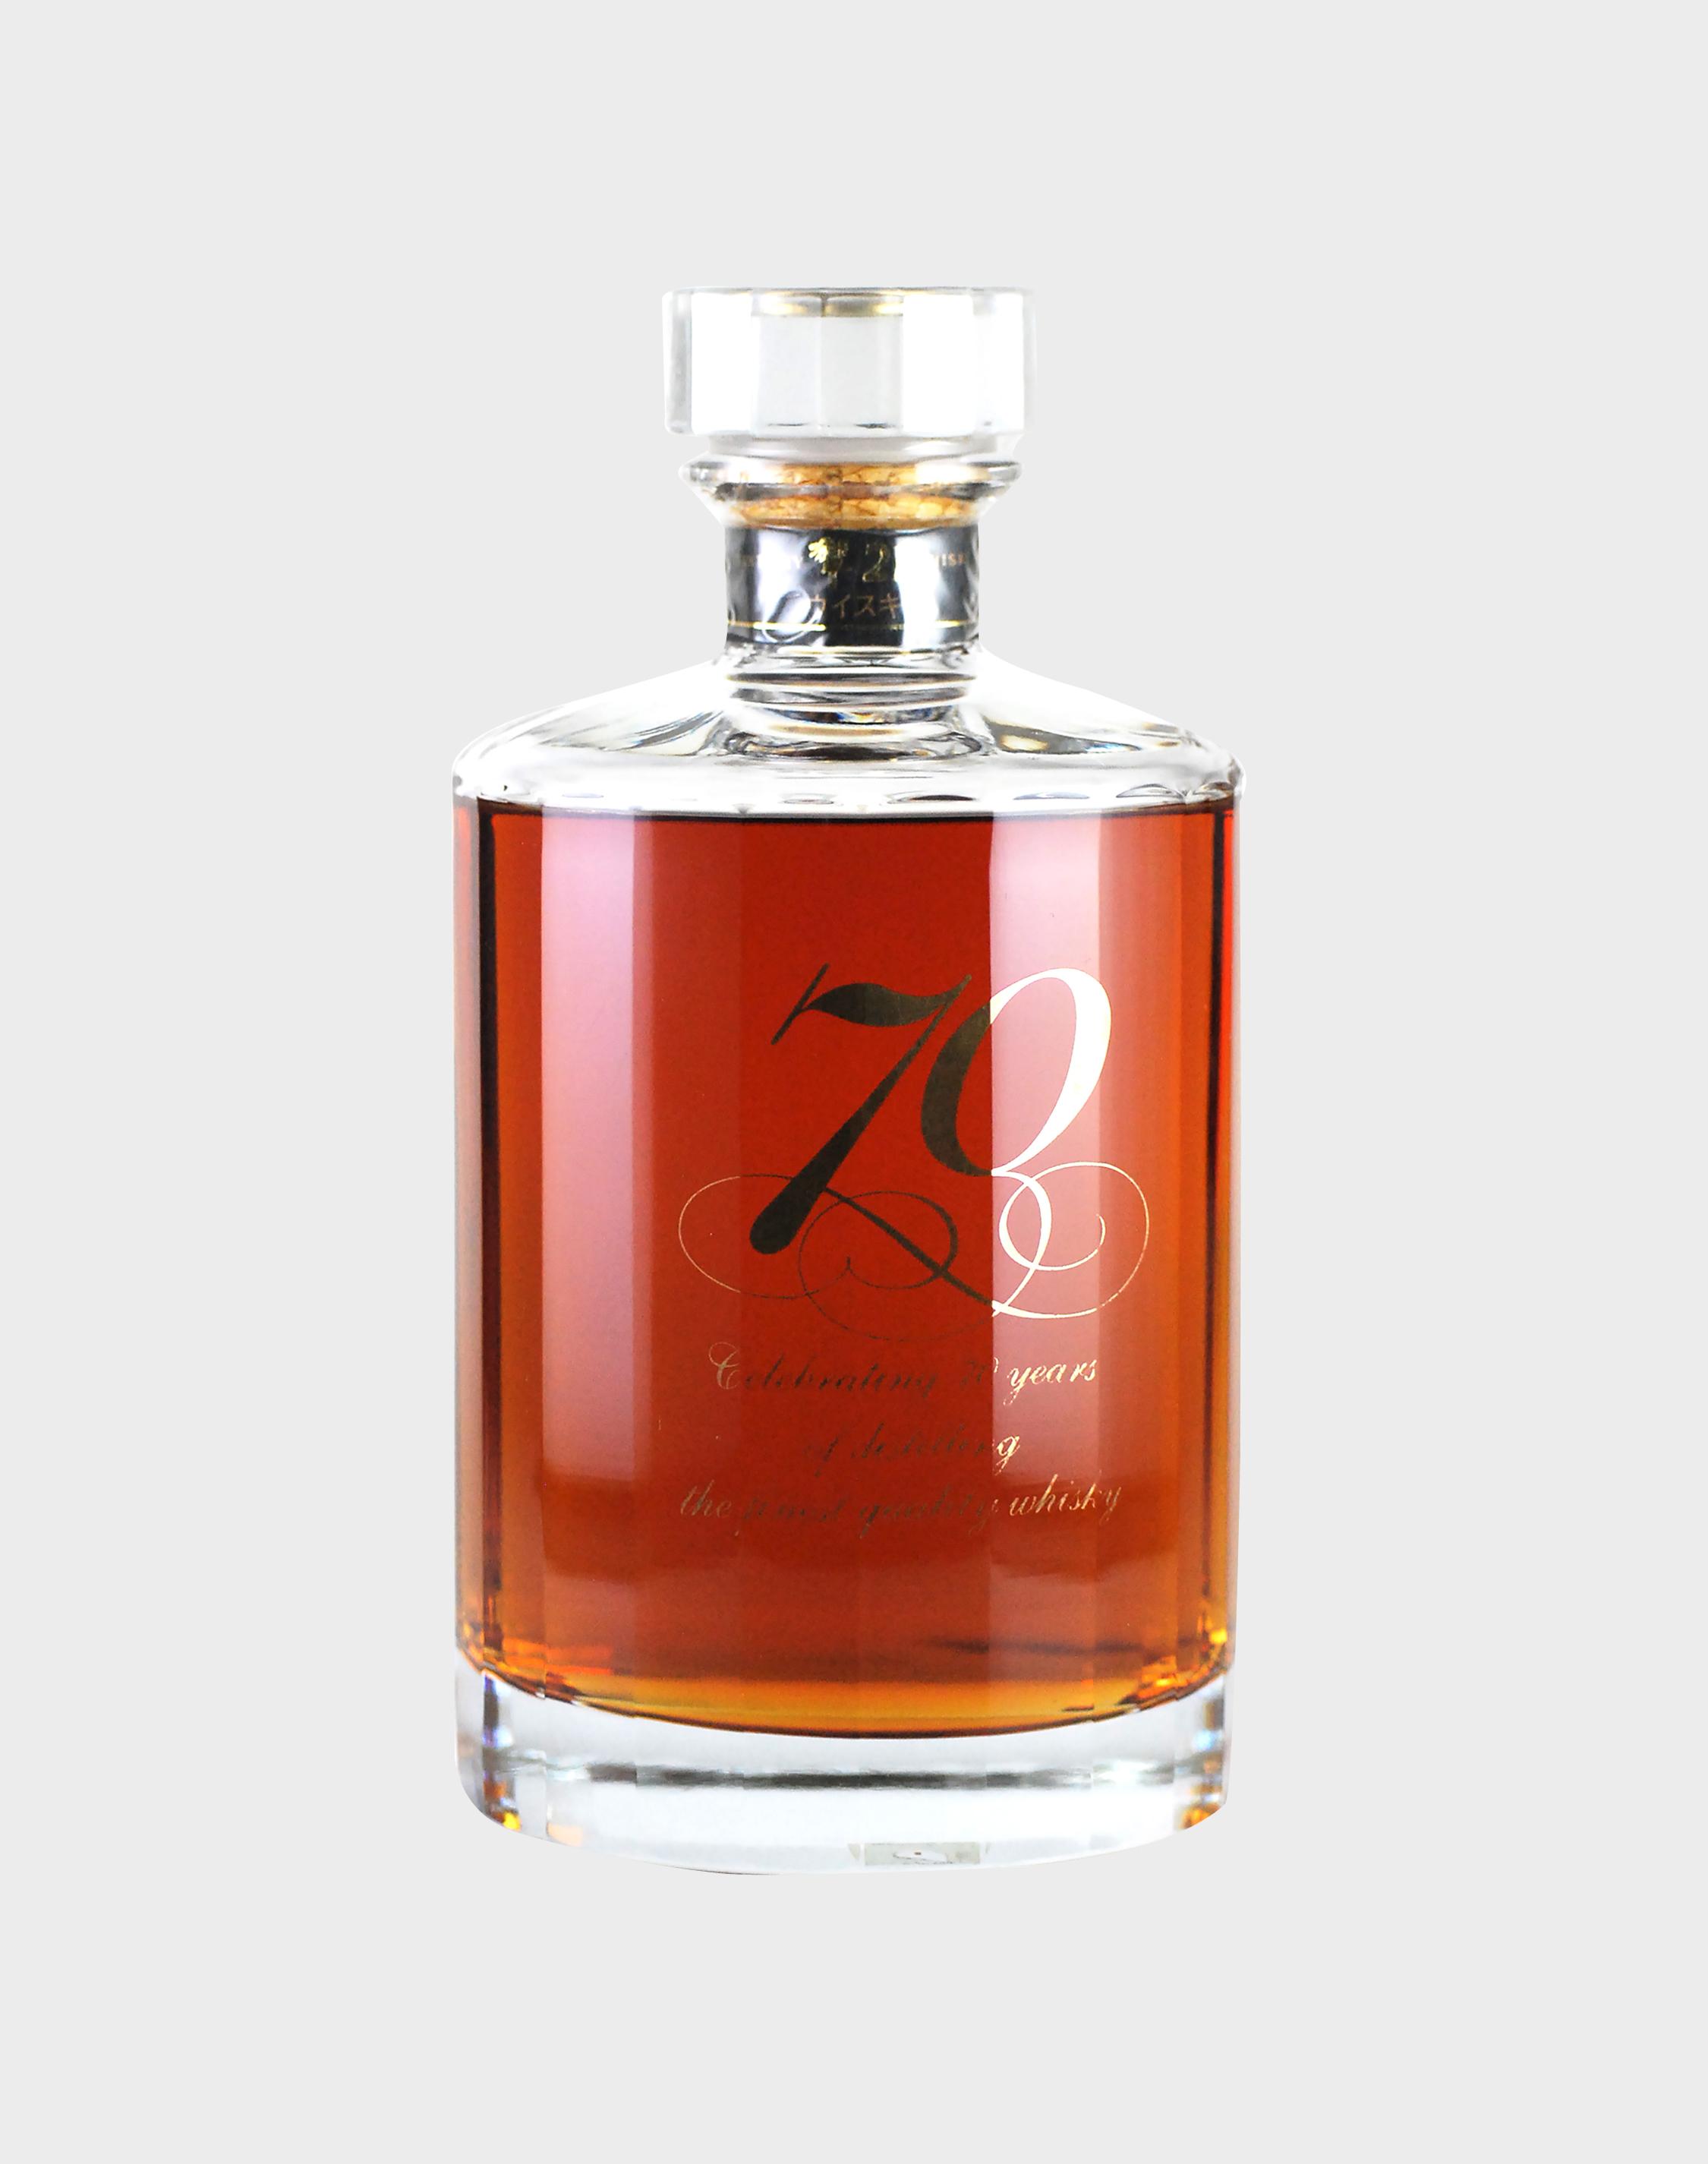 Hibiki 21 Years Old 70th Anniversary Japanese Whisky